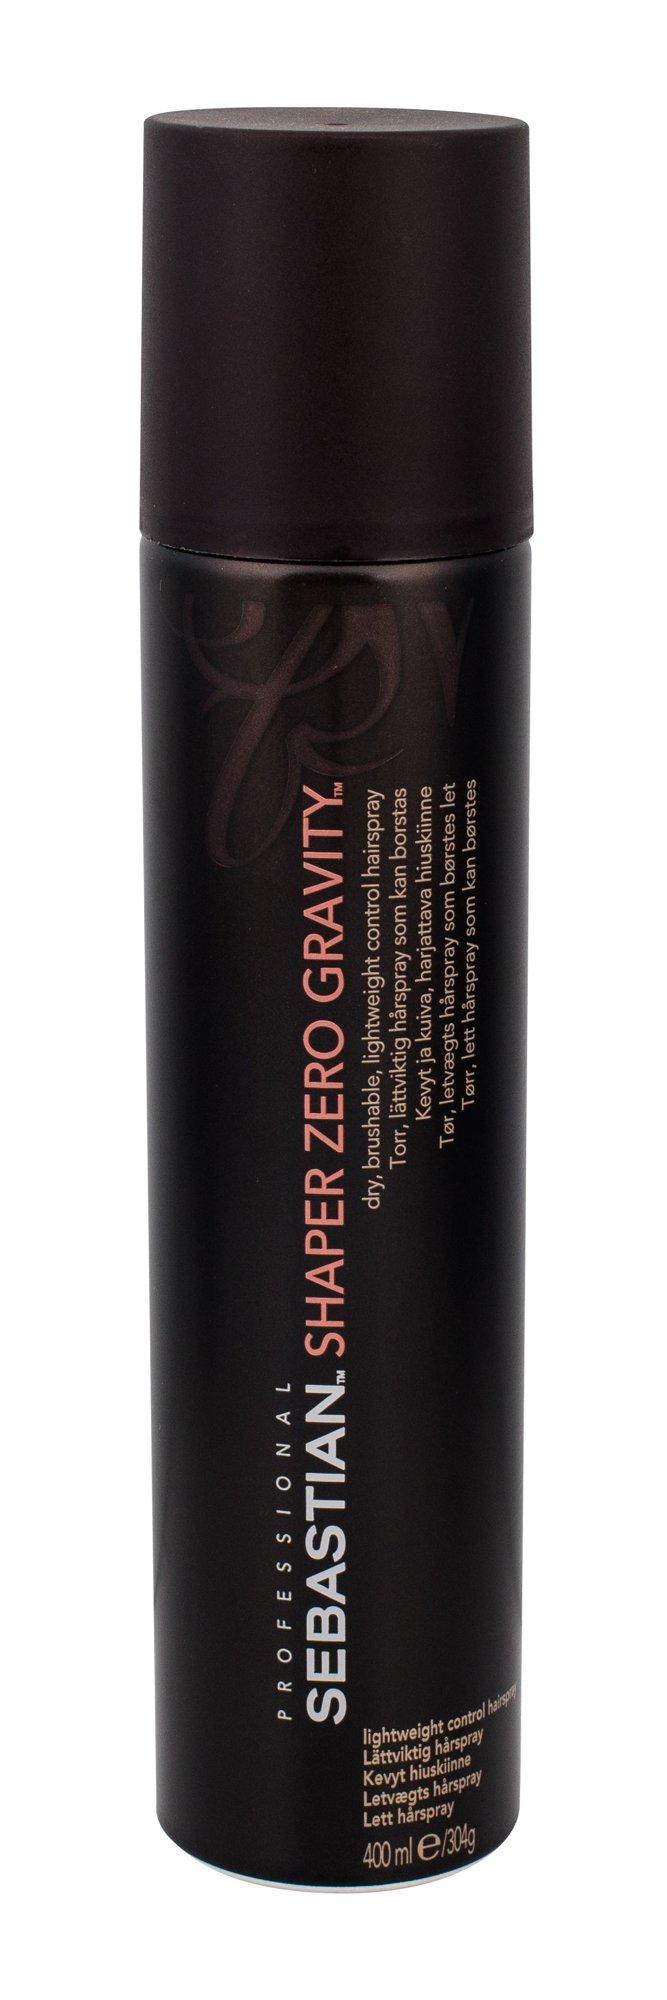 Sebastian Professional Shaper Zero Gravity Hair Spray 400ml